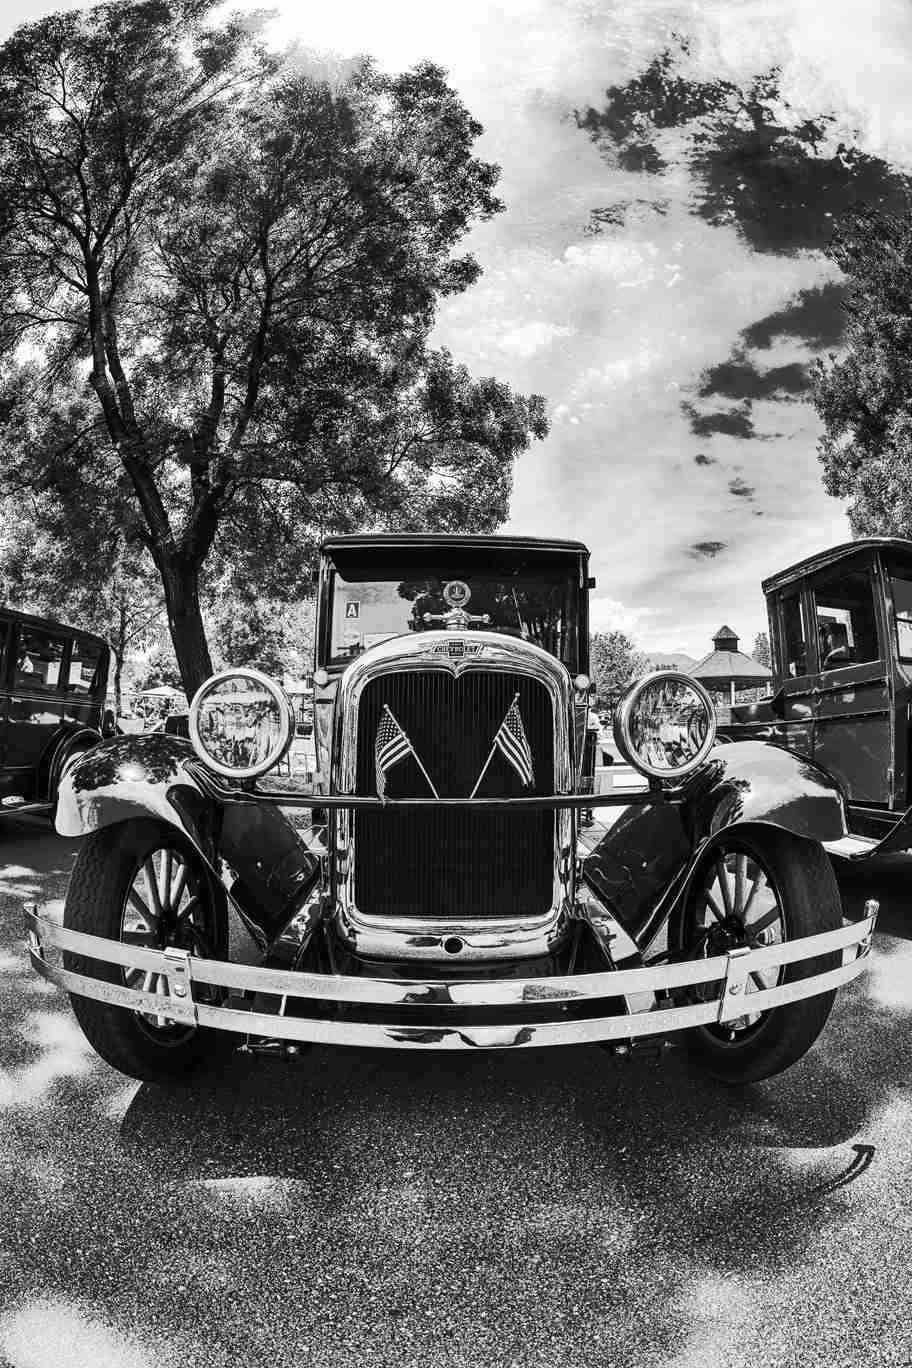 Black & White Print of a Classic Chevrolet Car